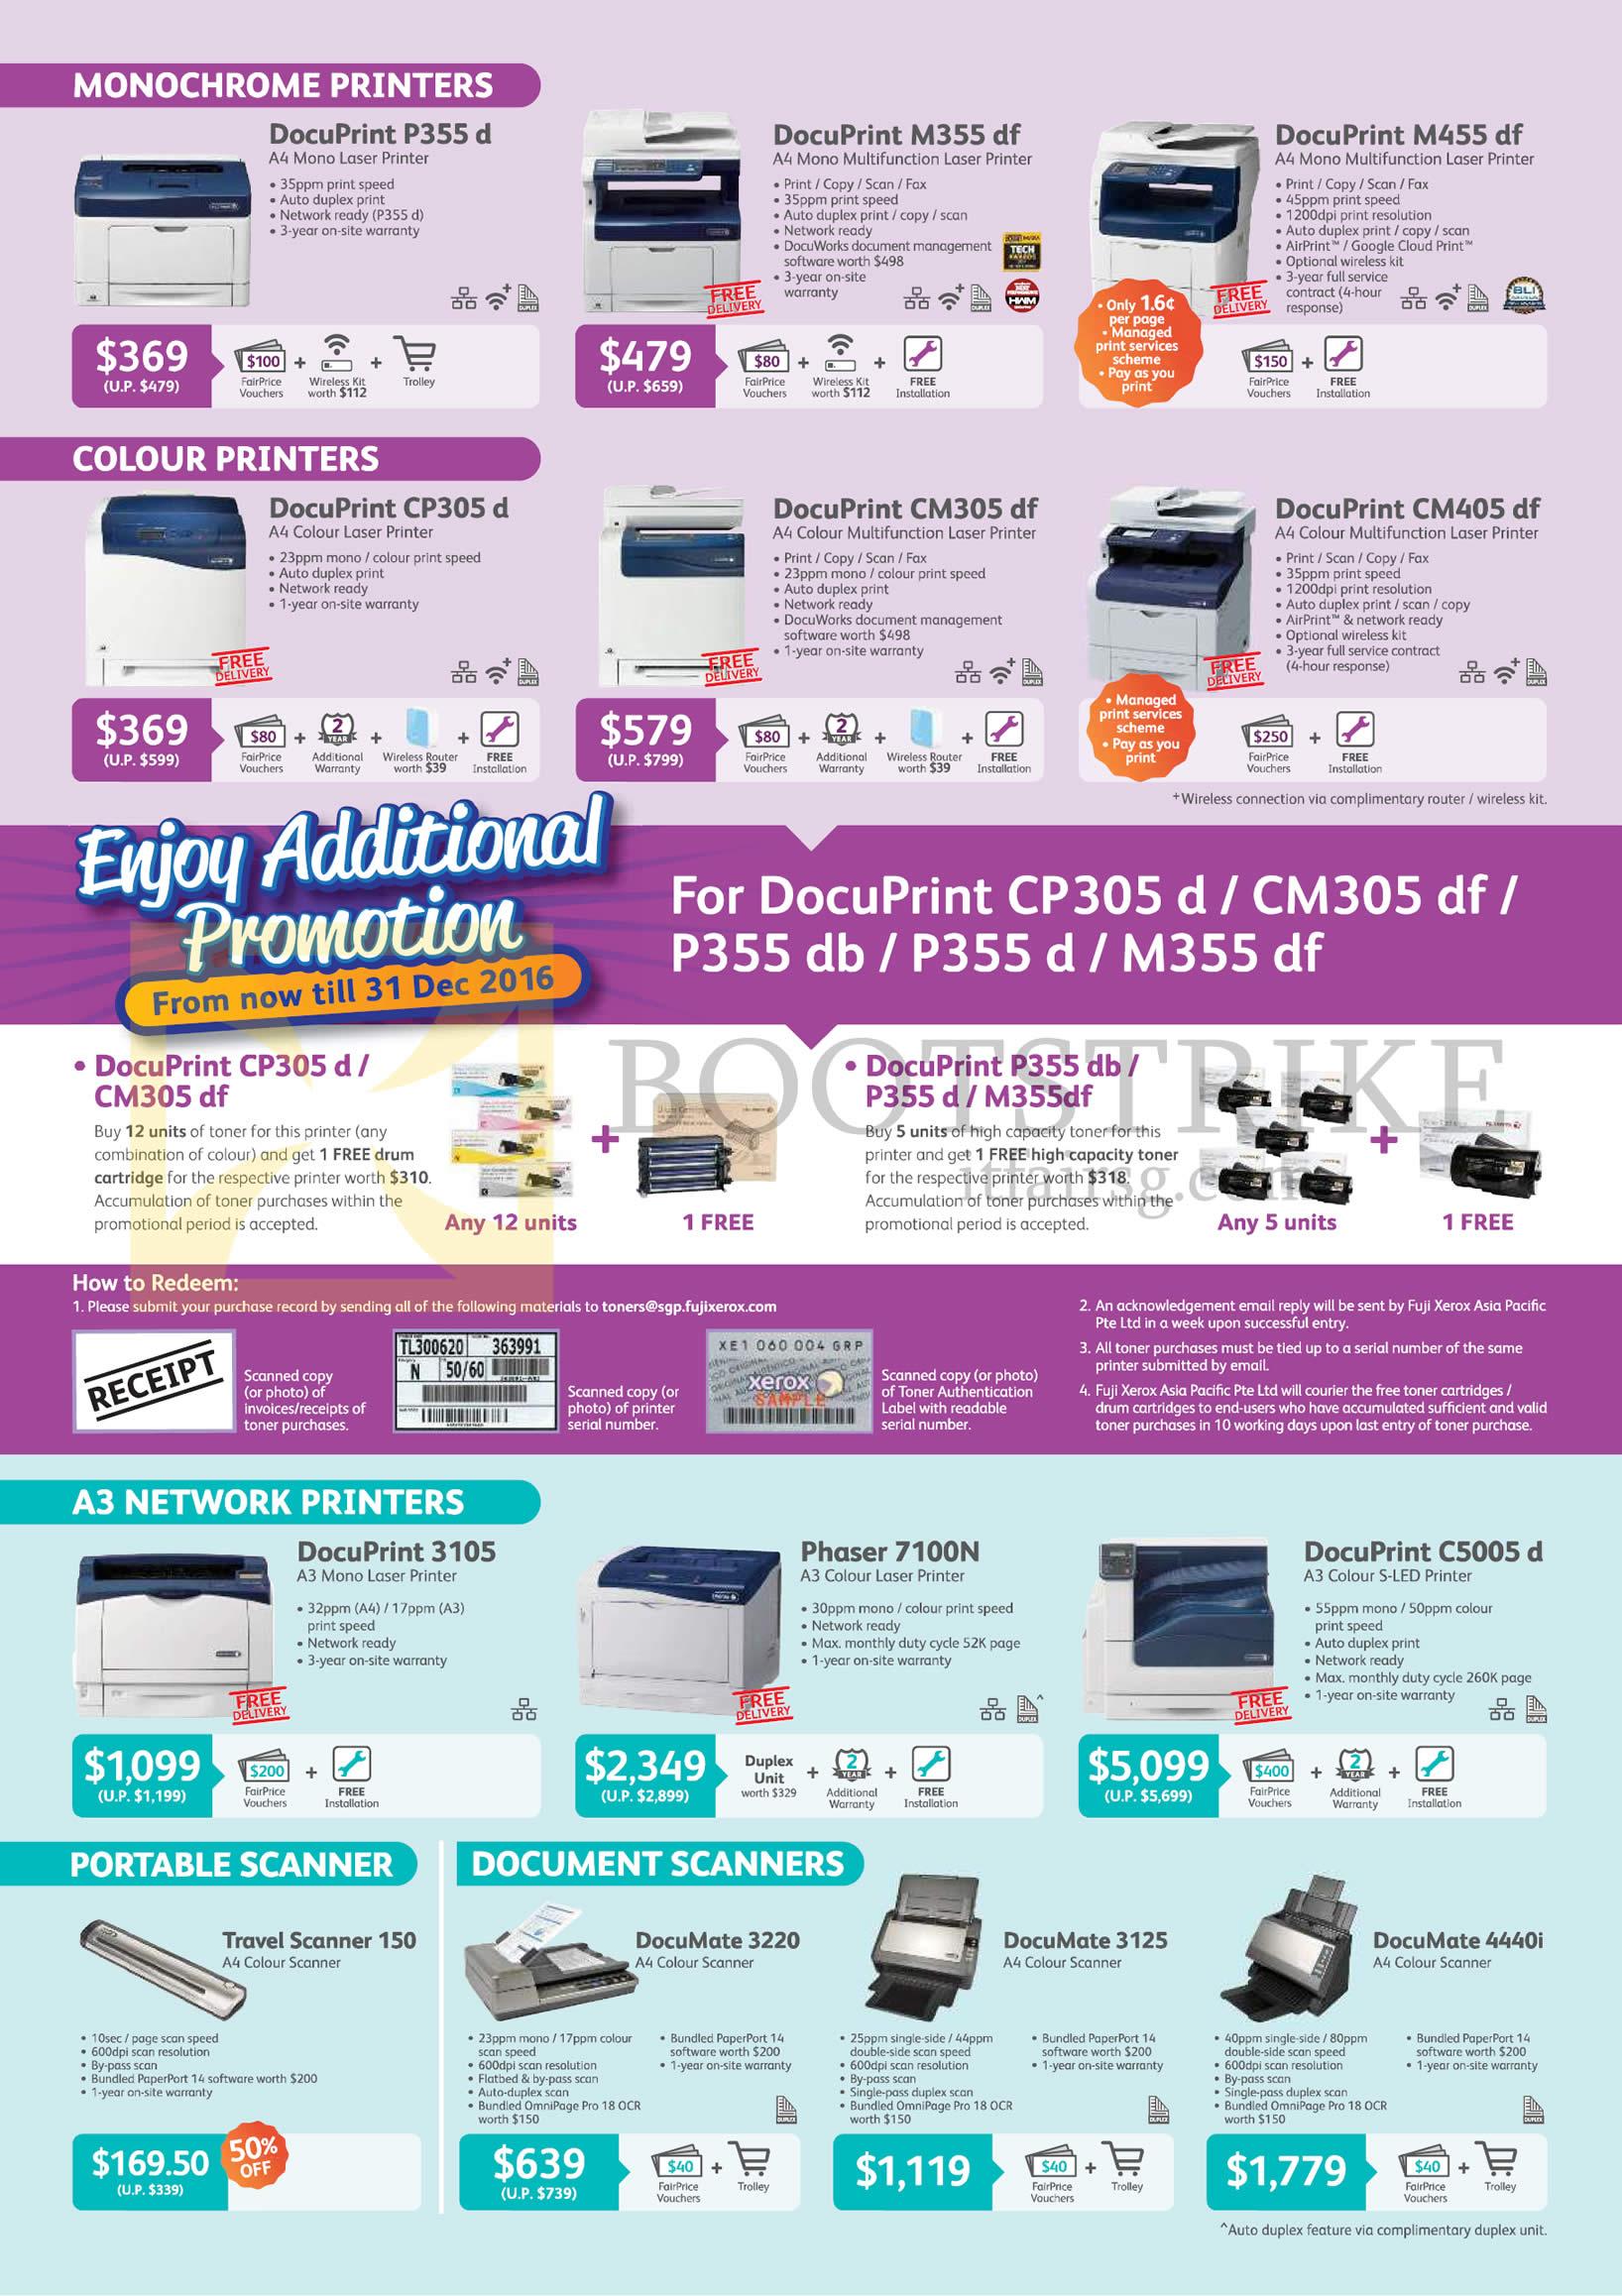 Fuji Xerox Printers Laser, Scanners, DocuPrint P355d, M355df, M455df